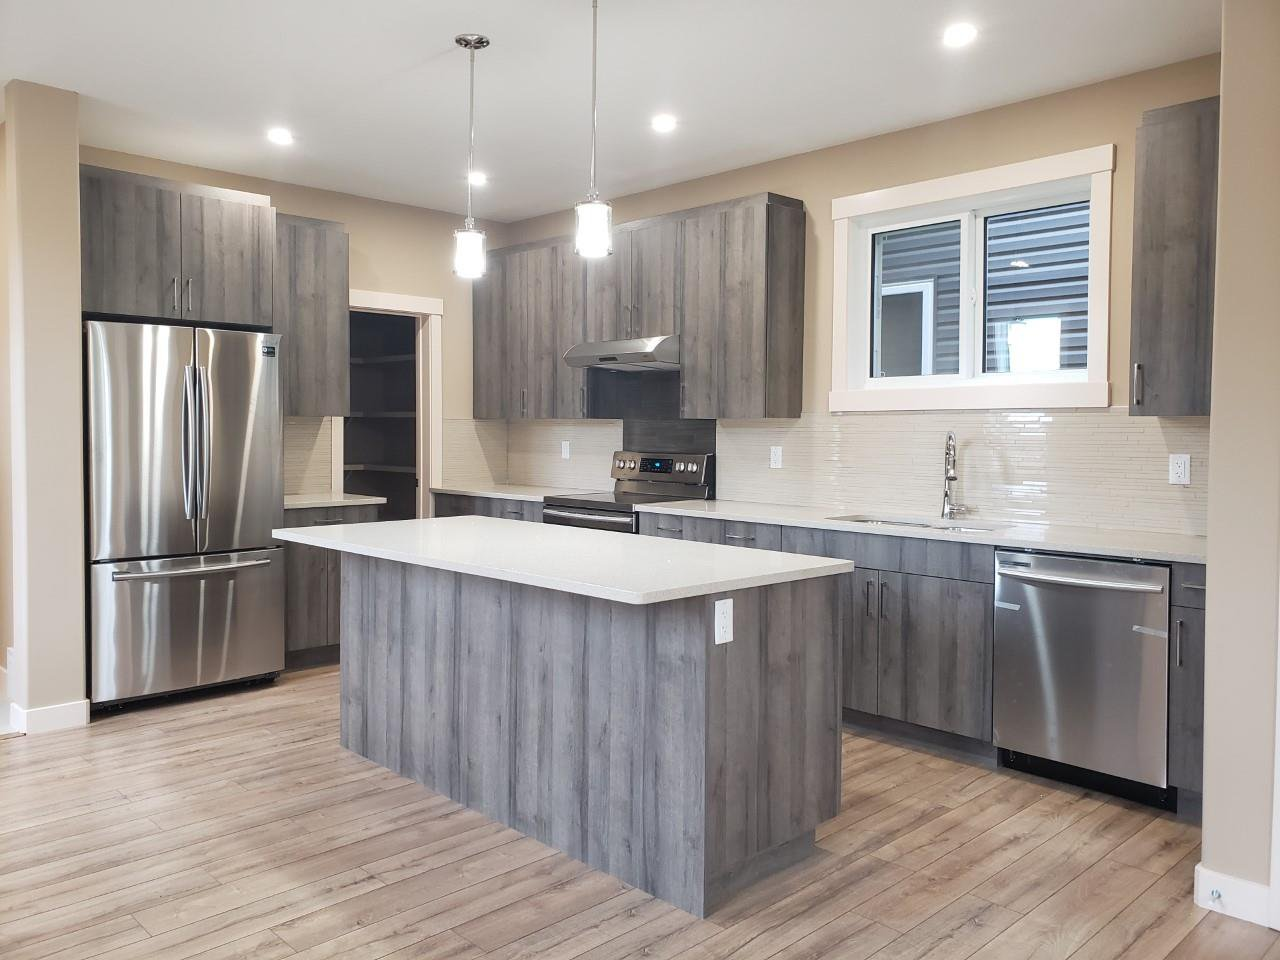 Main Photo: 9322 153 Street in Edmonton: Zone 22 House for sale : MLS®# E4162255